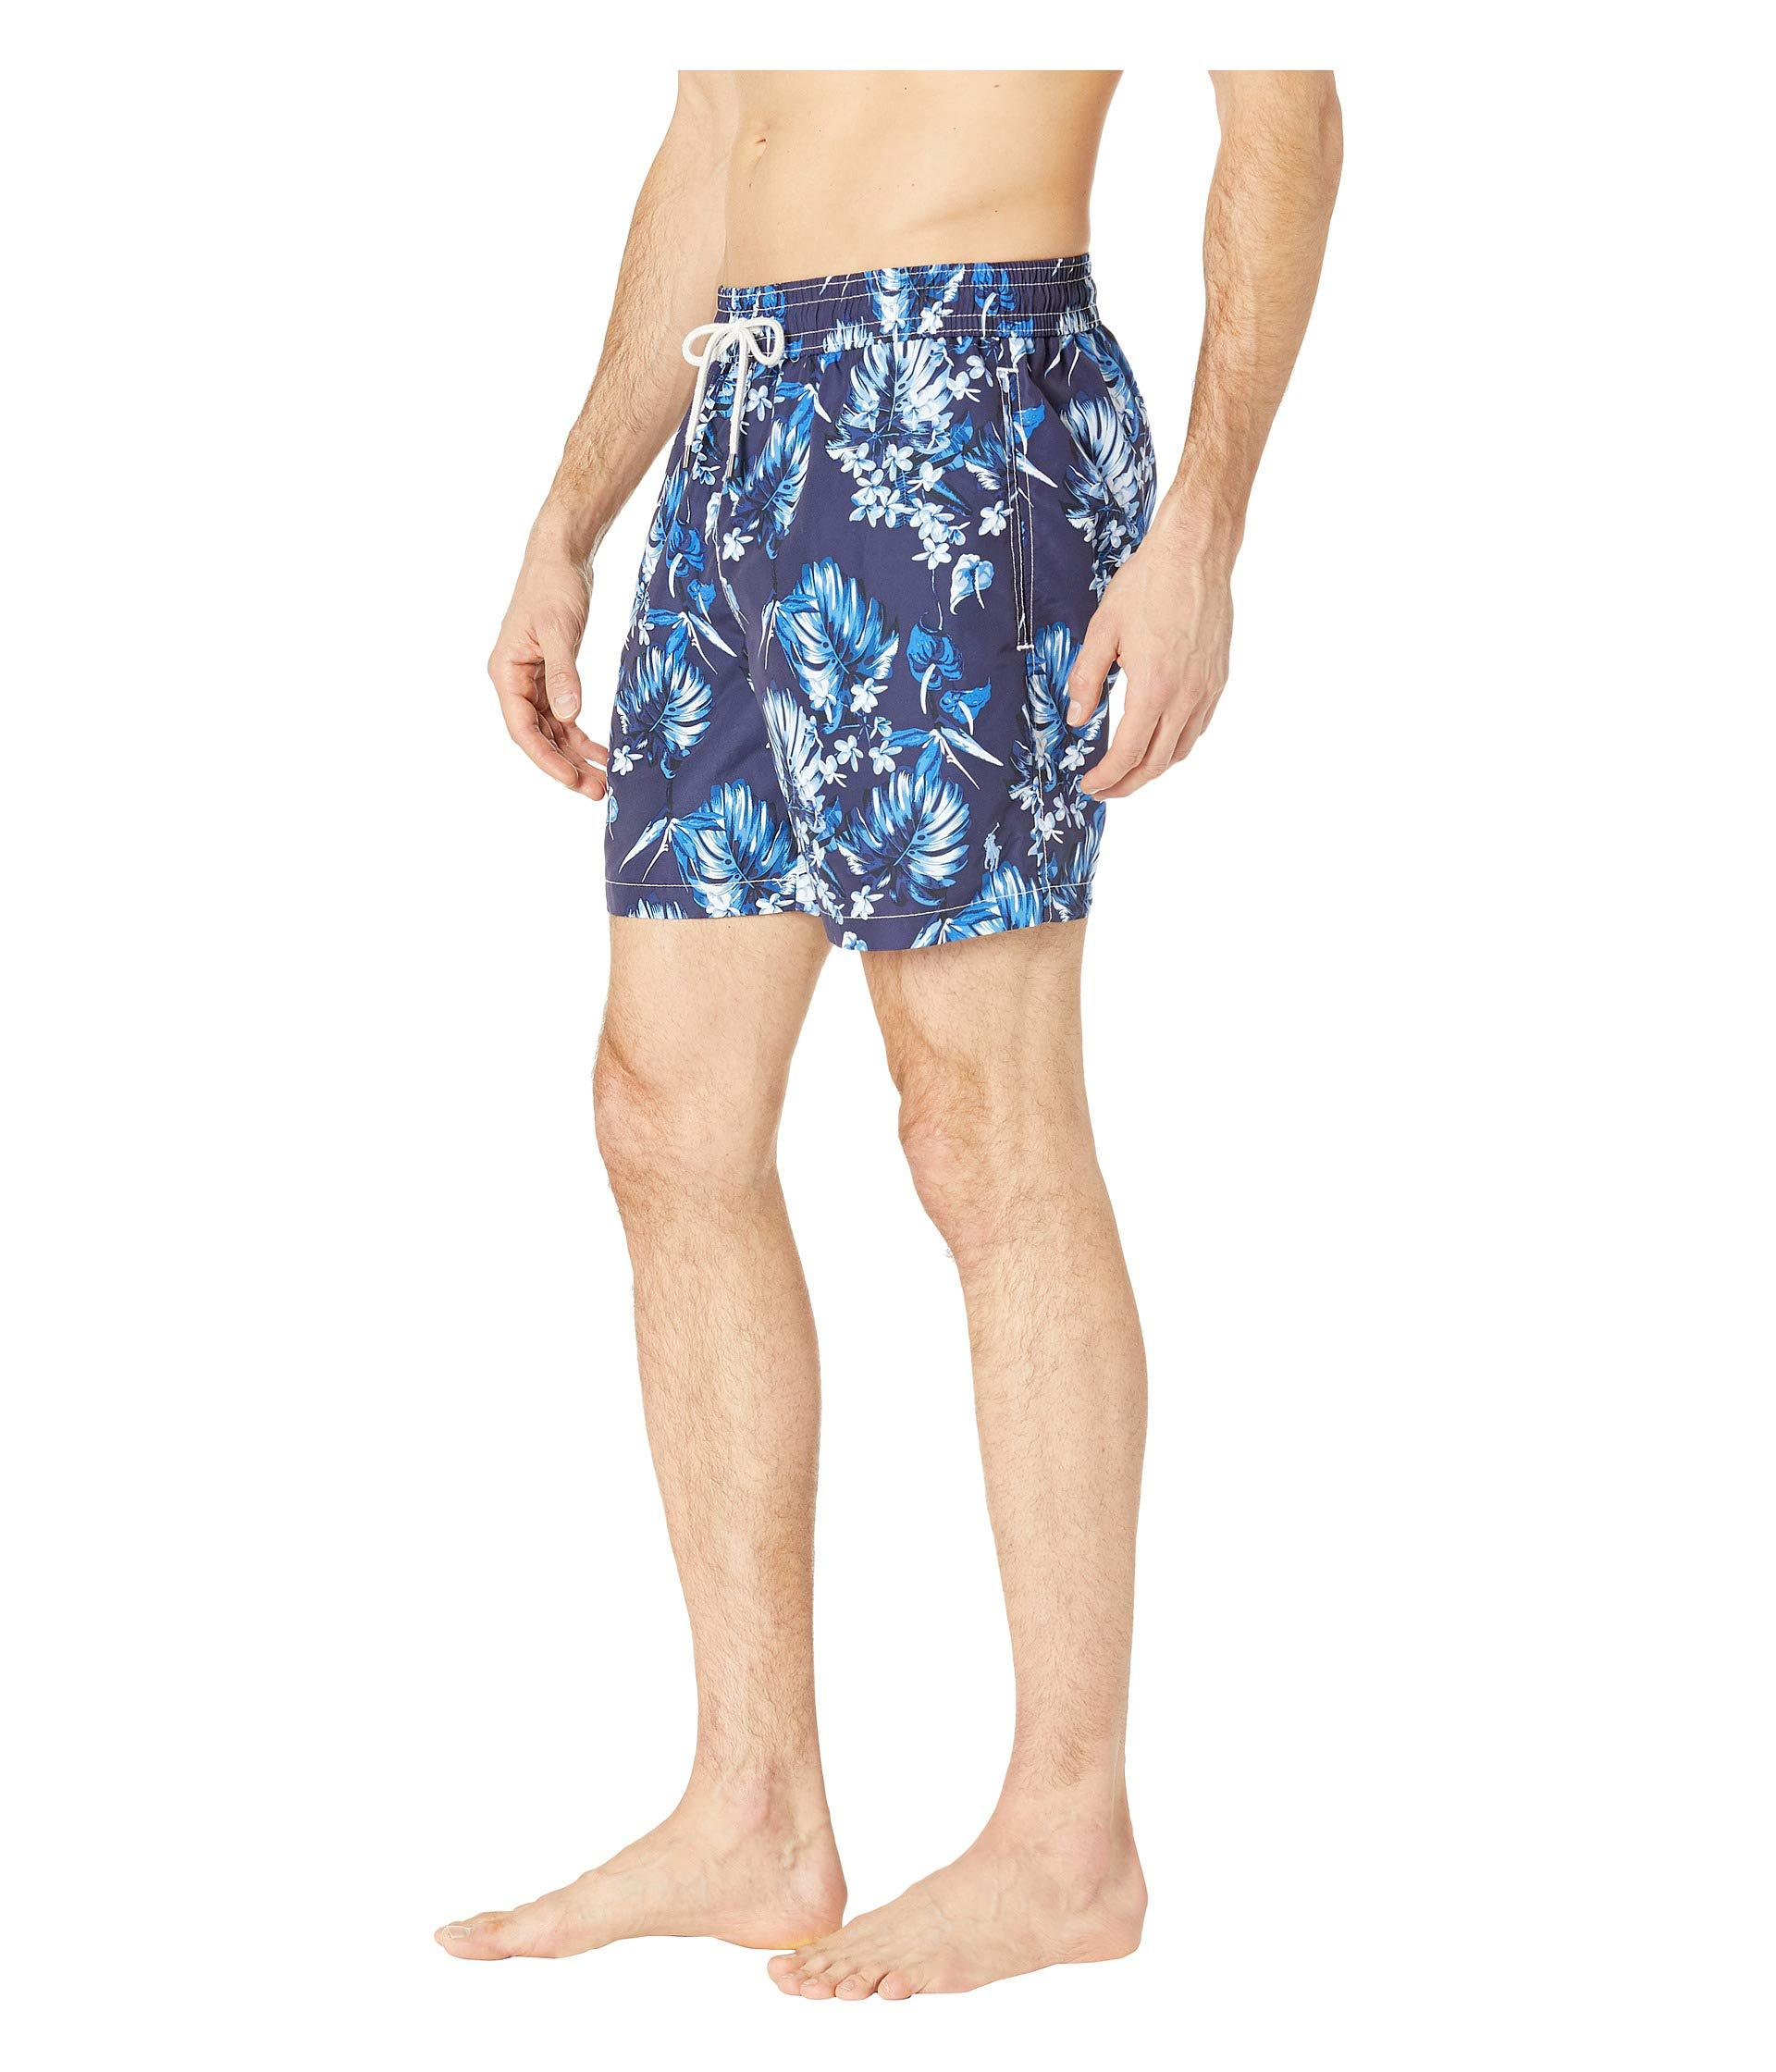 4dde63cdac ... new style lyst polo ralph lauren midnight floral traveler swim trunks  tonal flower mens swimwear in